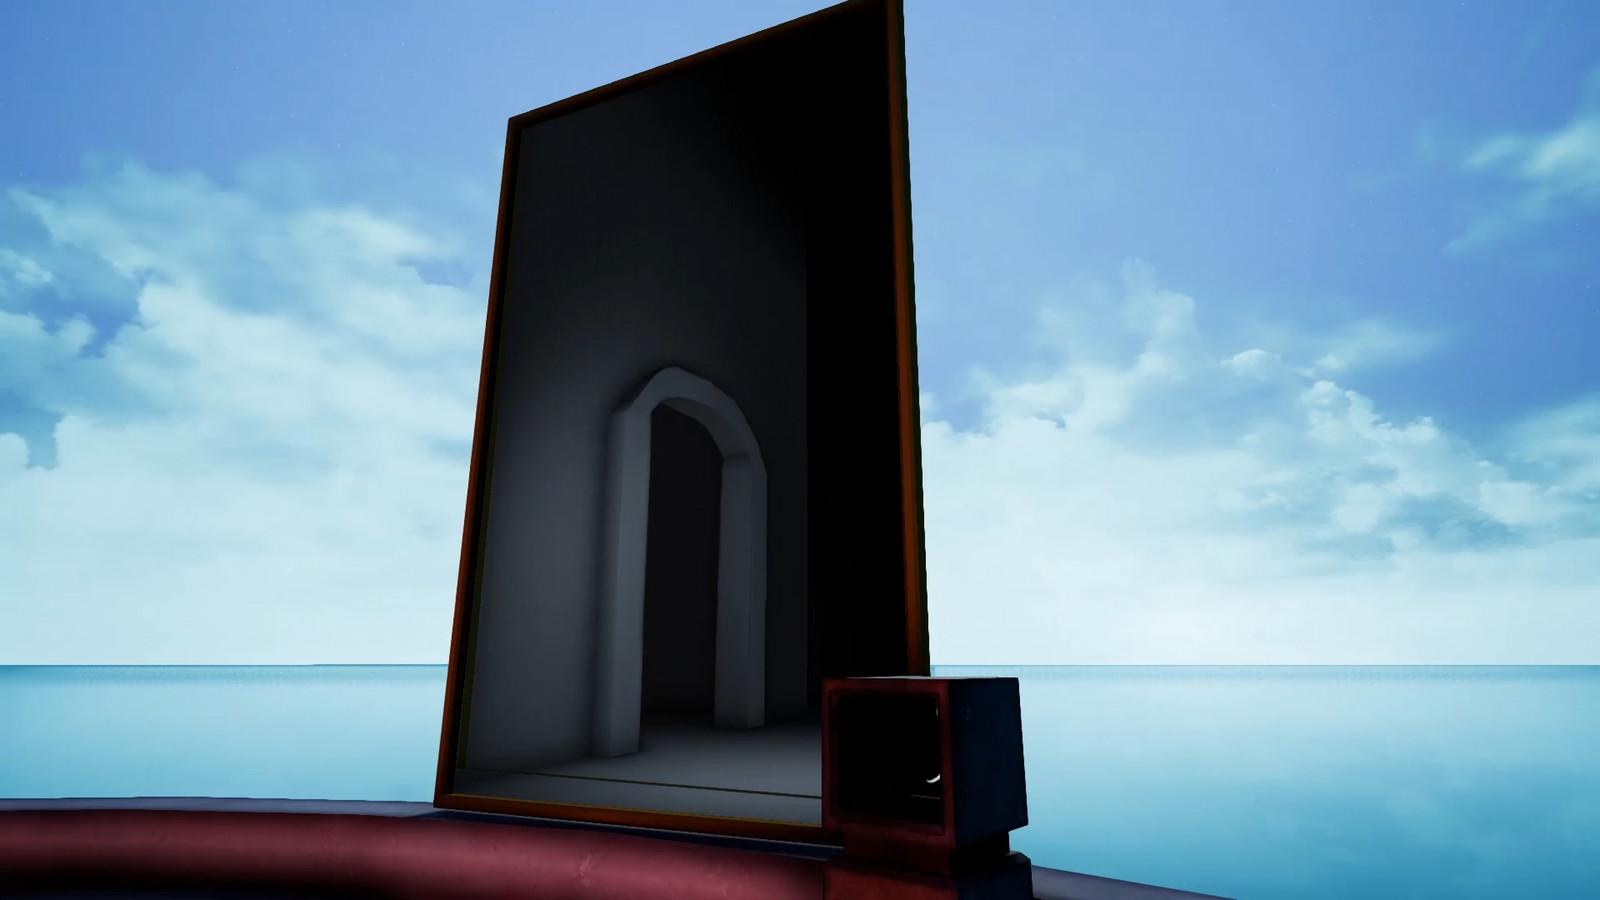 I created a seamless portal-like teleportation system using blueprints